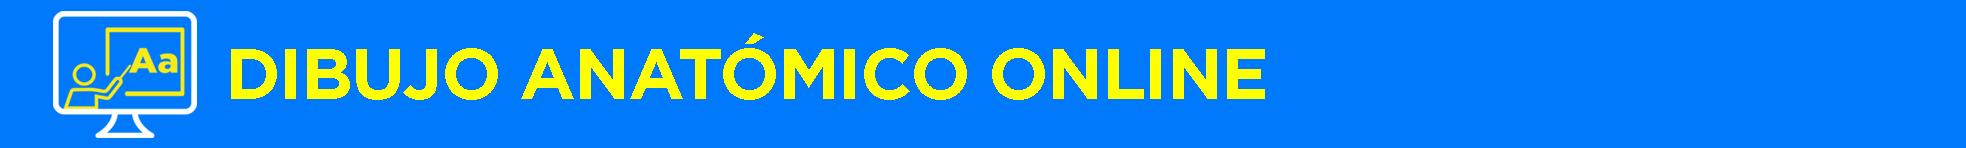 Banner título Dibujo Anatómico Online